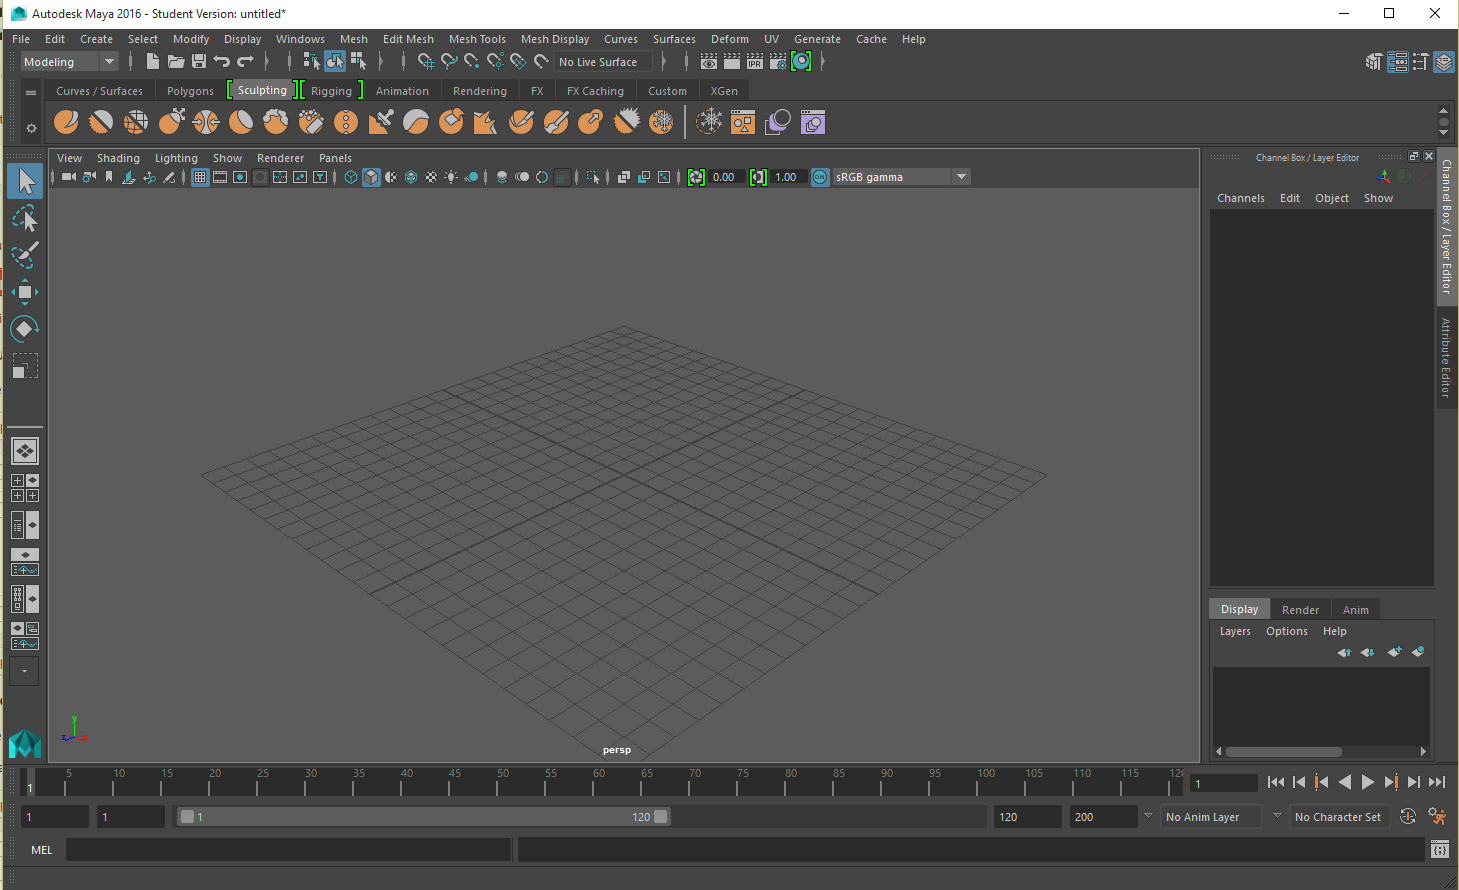 Autodesk Maya 2016 screenshot